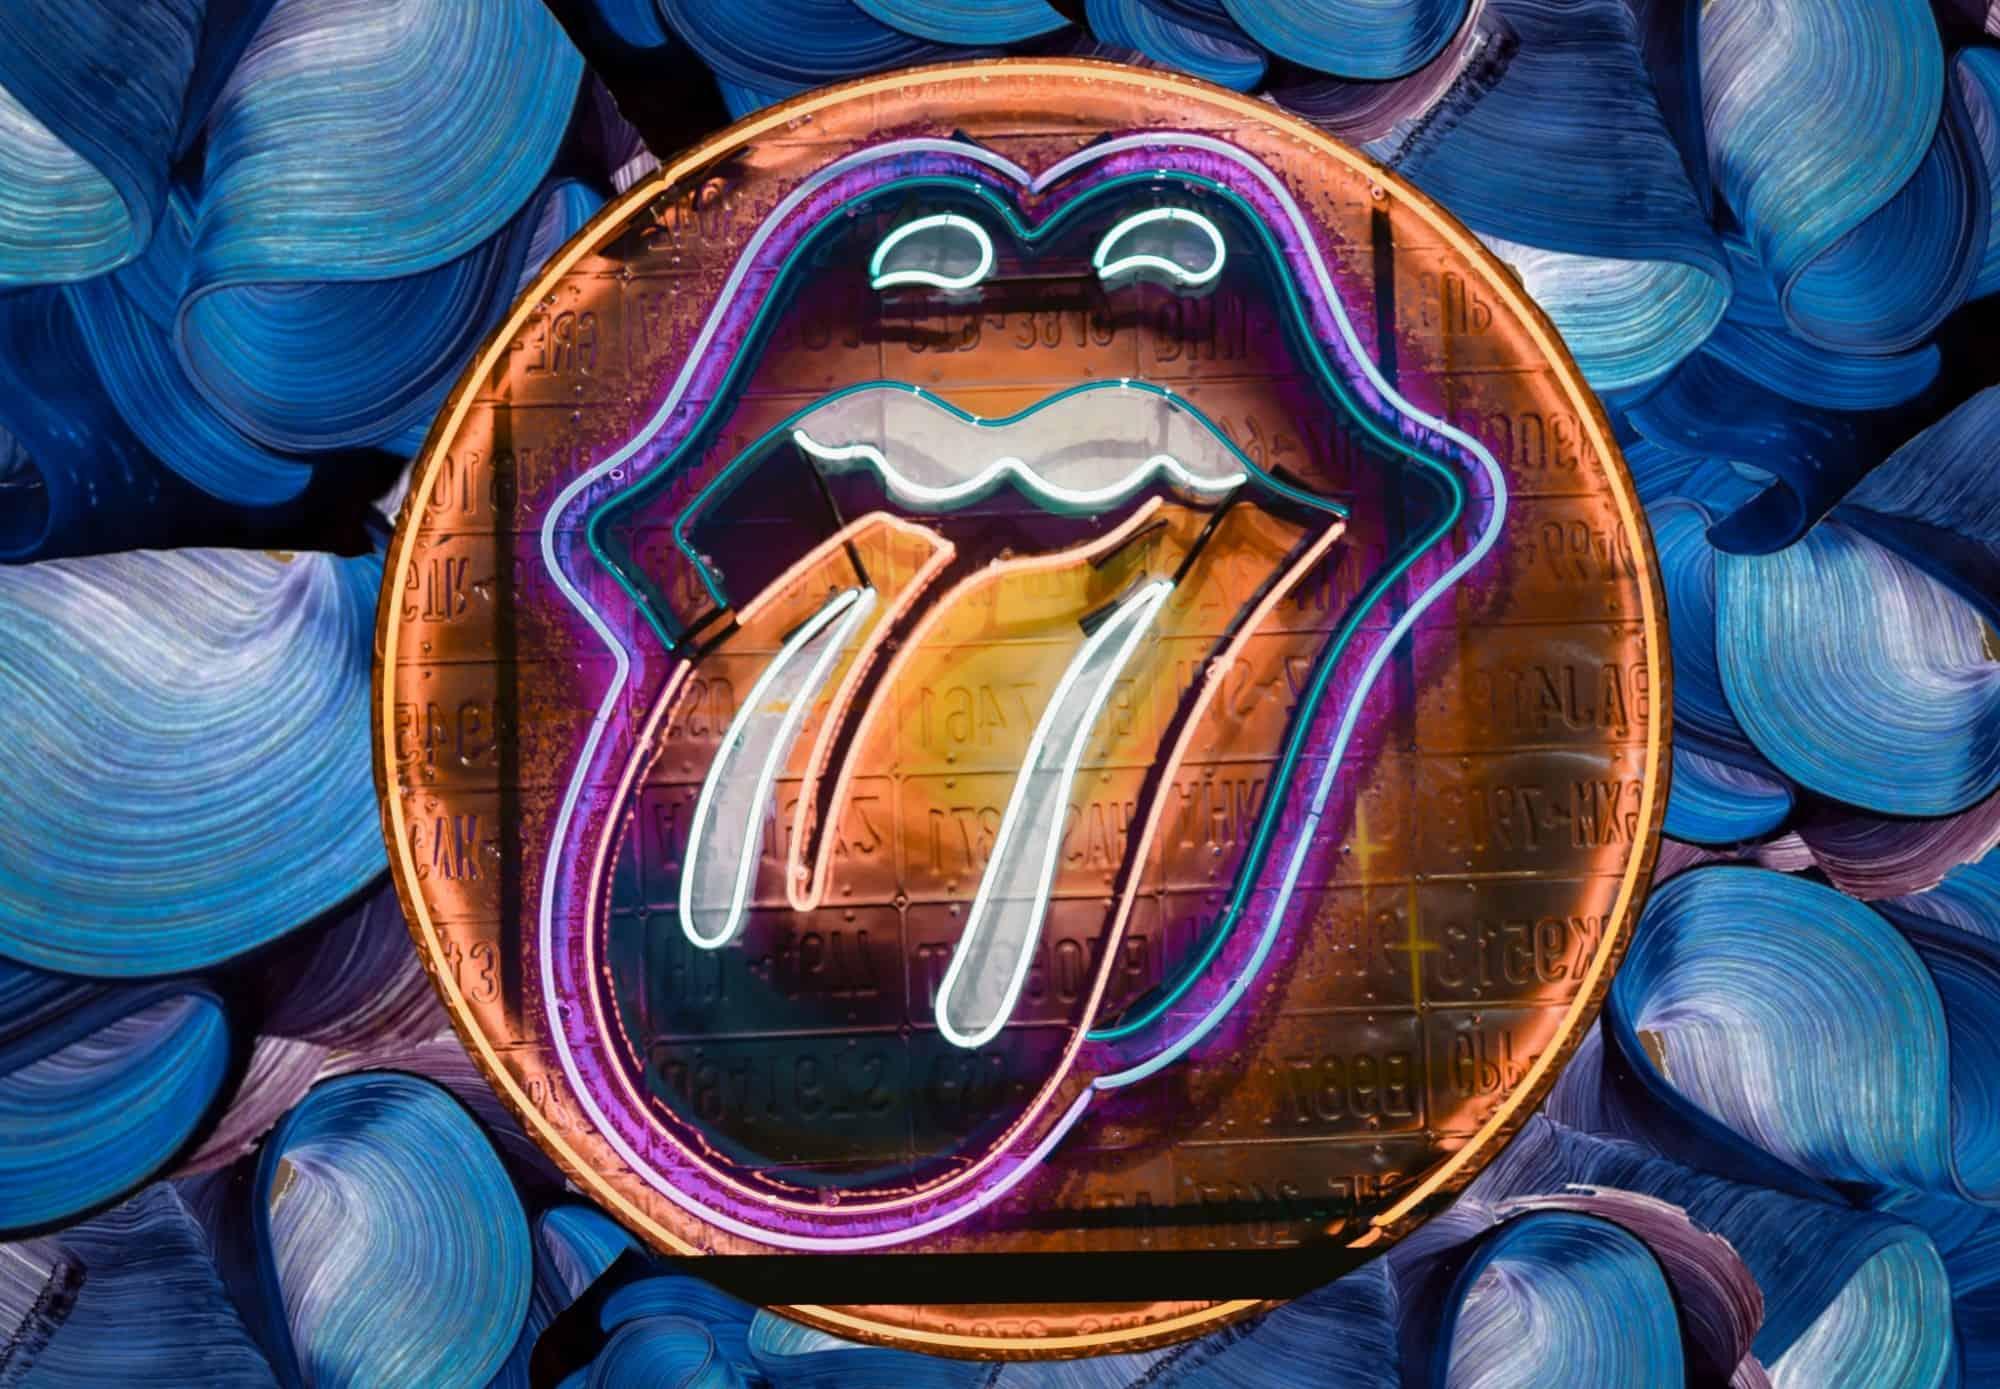 Neon Rolling Stones logo